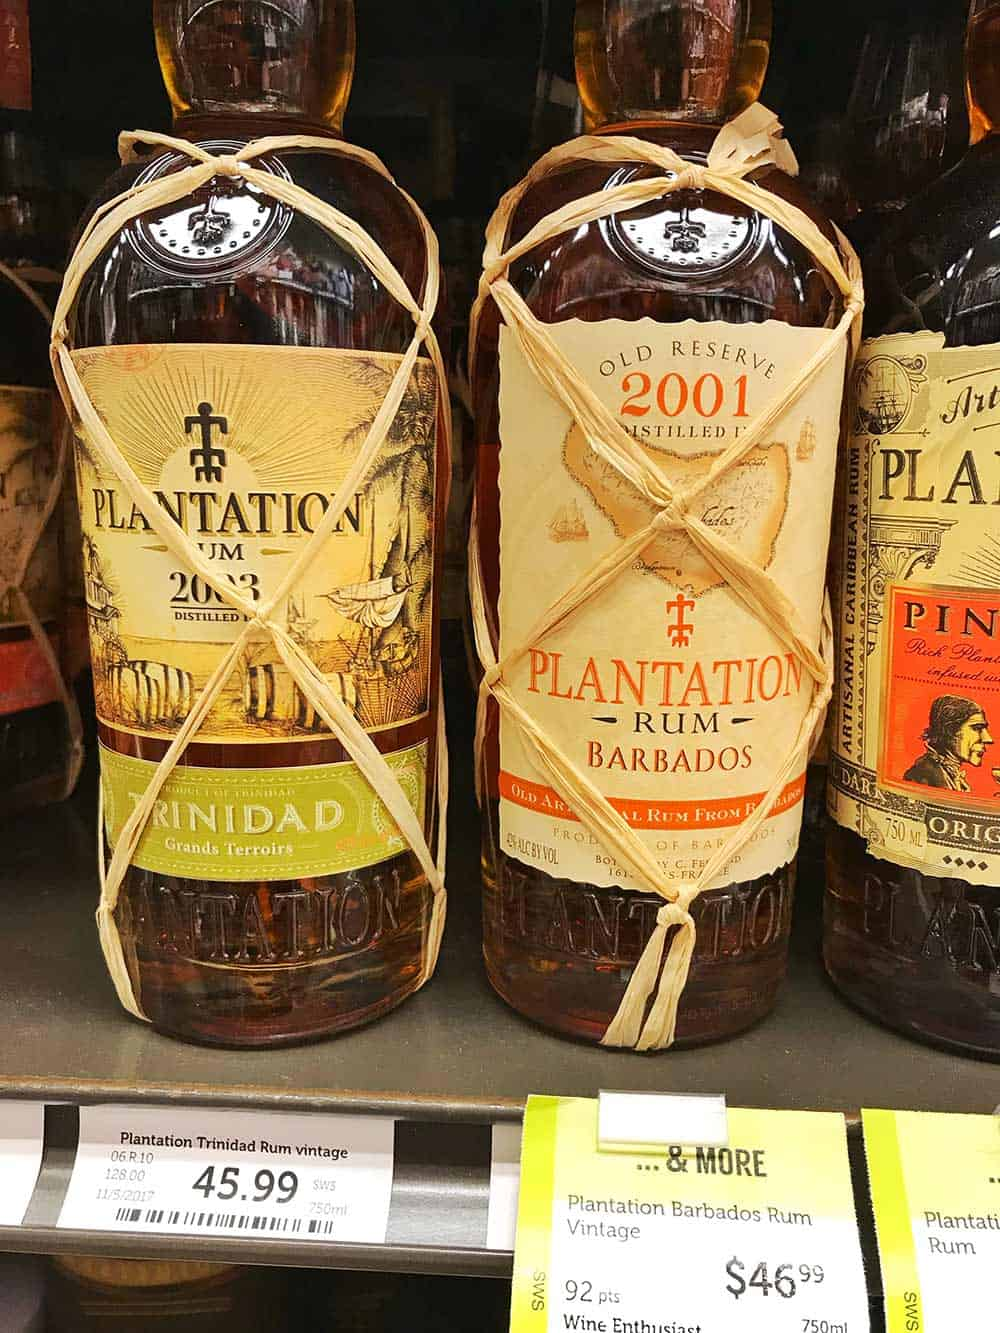 Plantation rum gift ideas